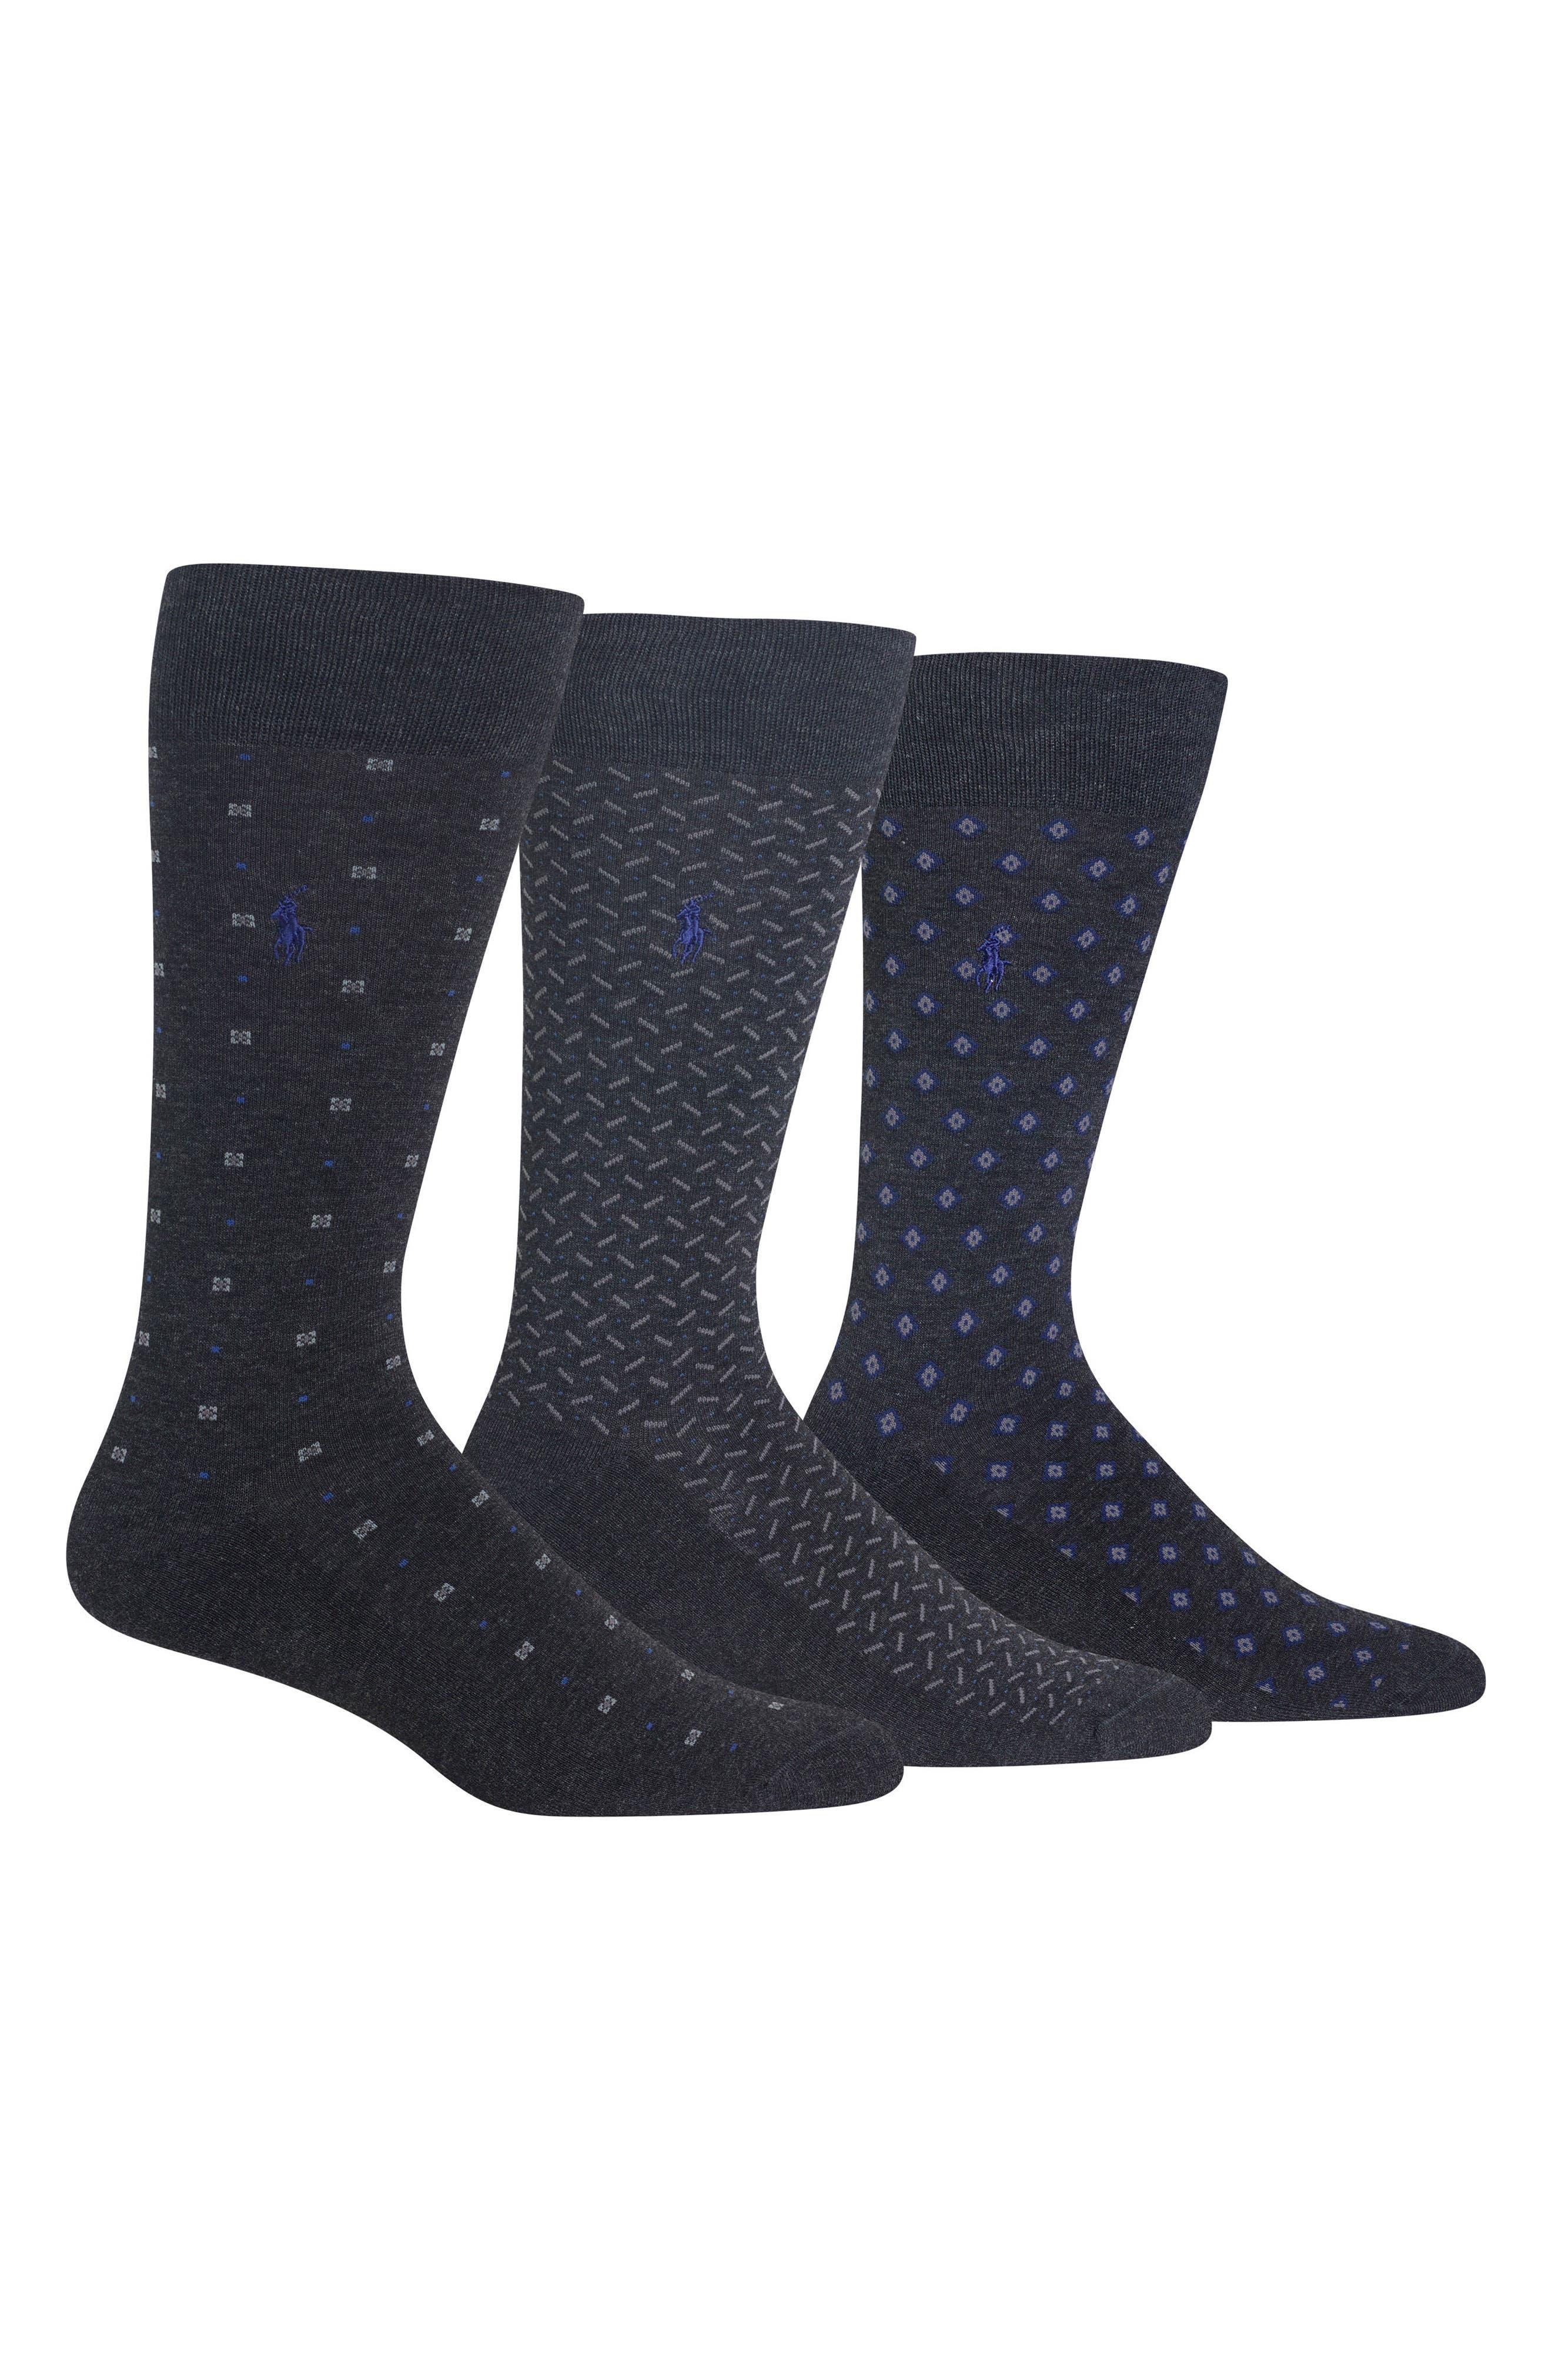 3-Pack Performance Socks,                             Main thumbnail 1, color,                             001